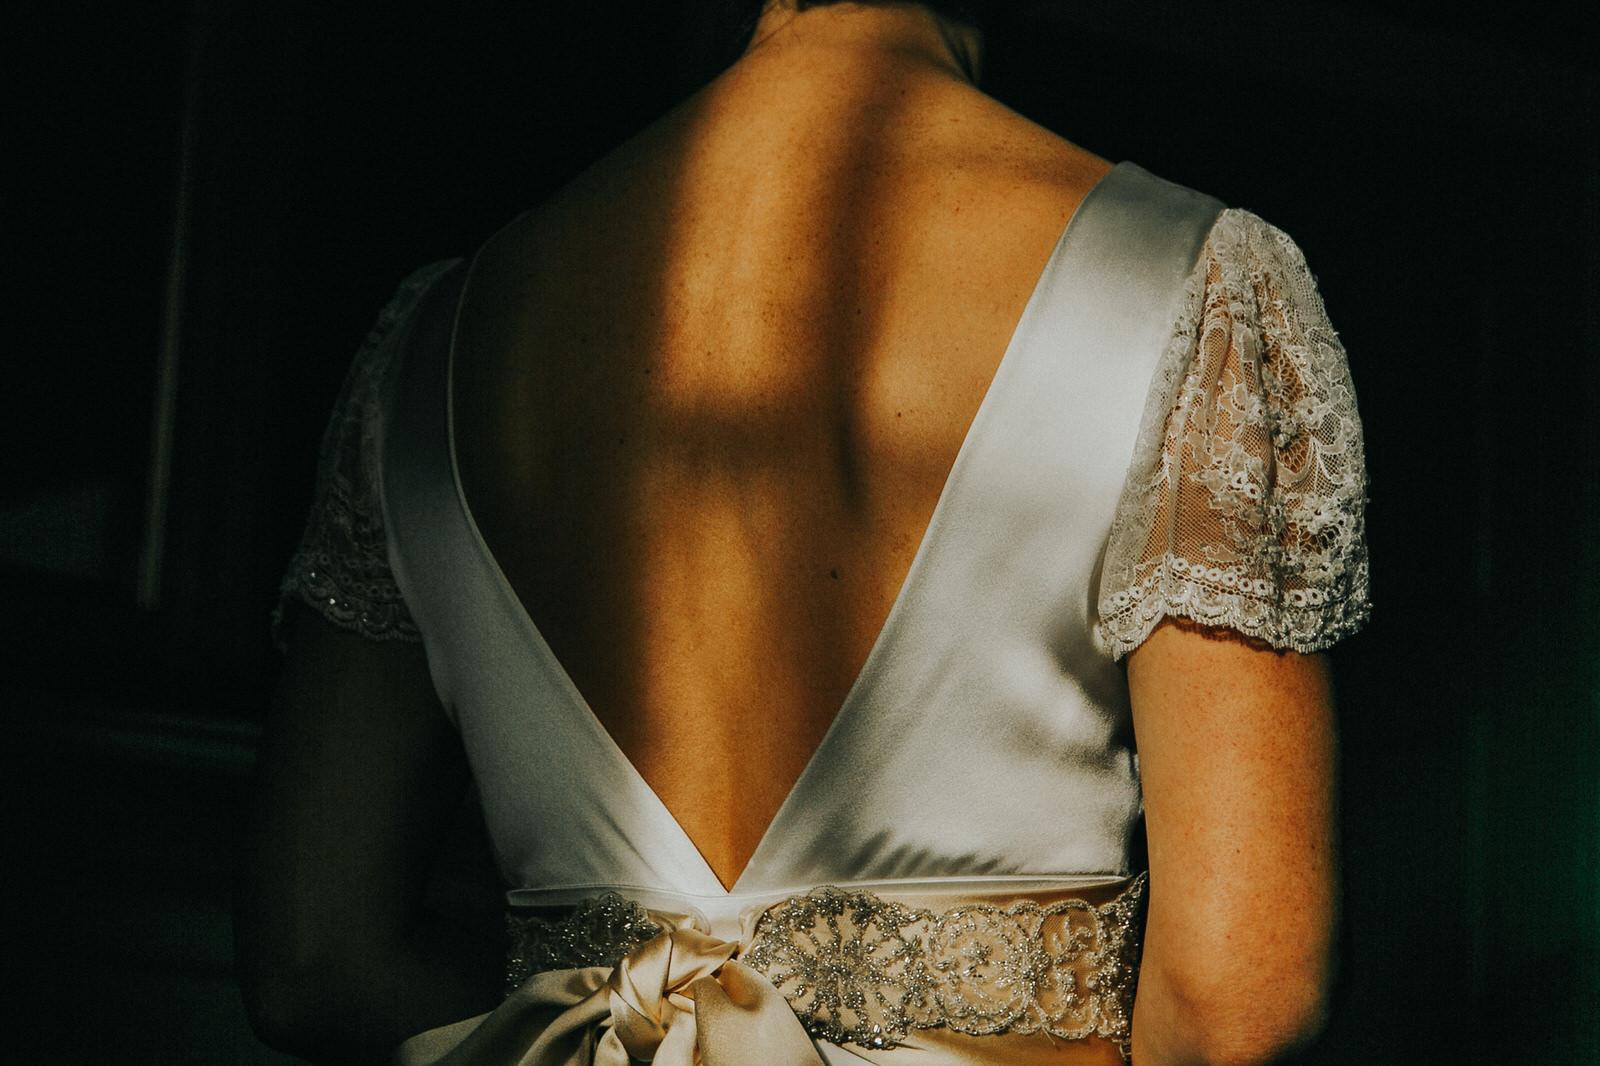 Dunbrody_House_Wedding_photographer_045.jpg